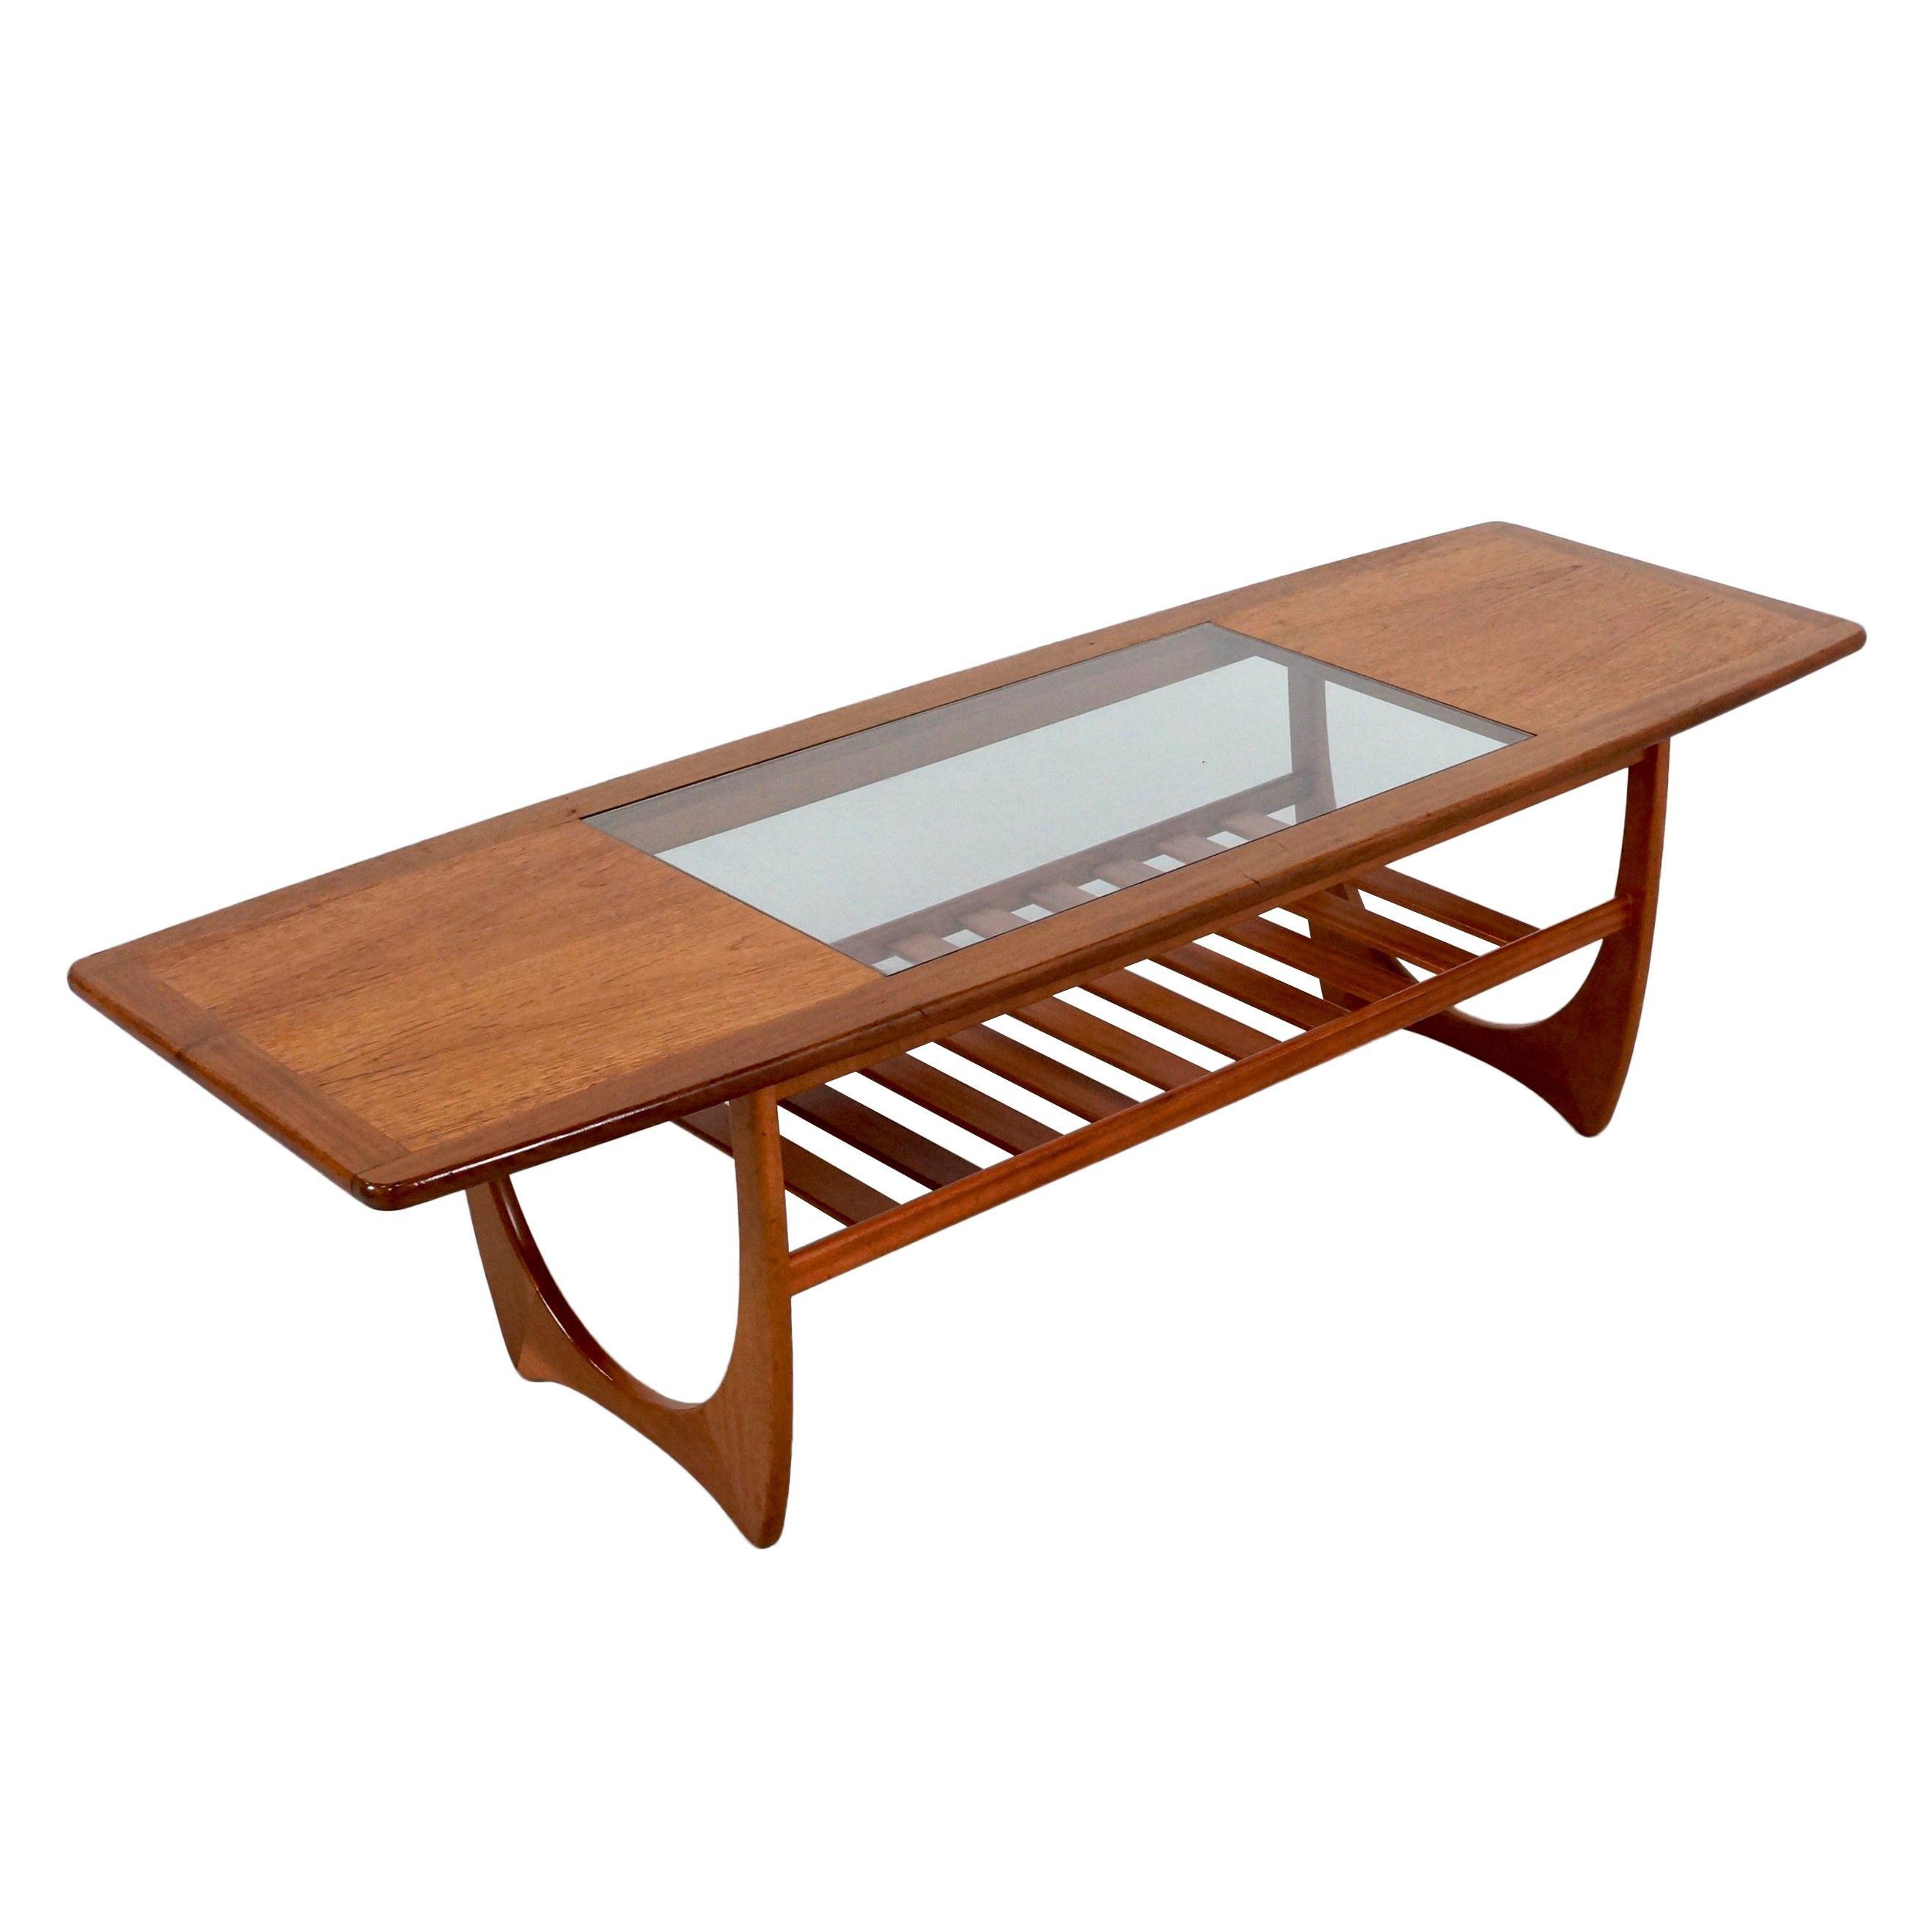 Pg plan long john fresco coffee table in teak slatted shelf pg plan long john fresco coffee table in teak slatted shelf underneath geotapseo Images